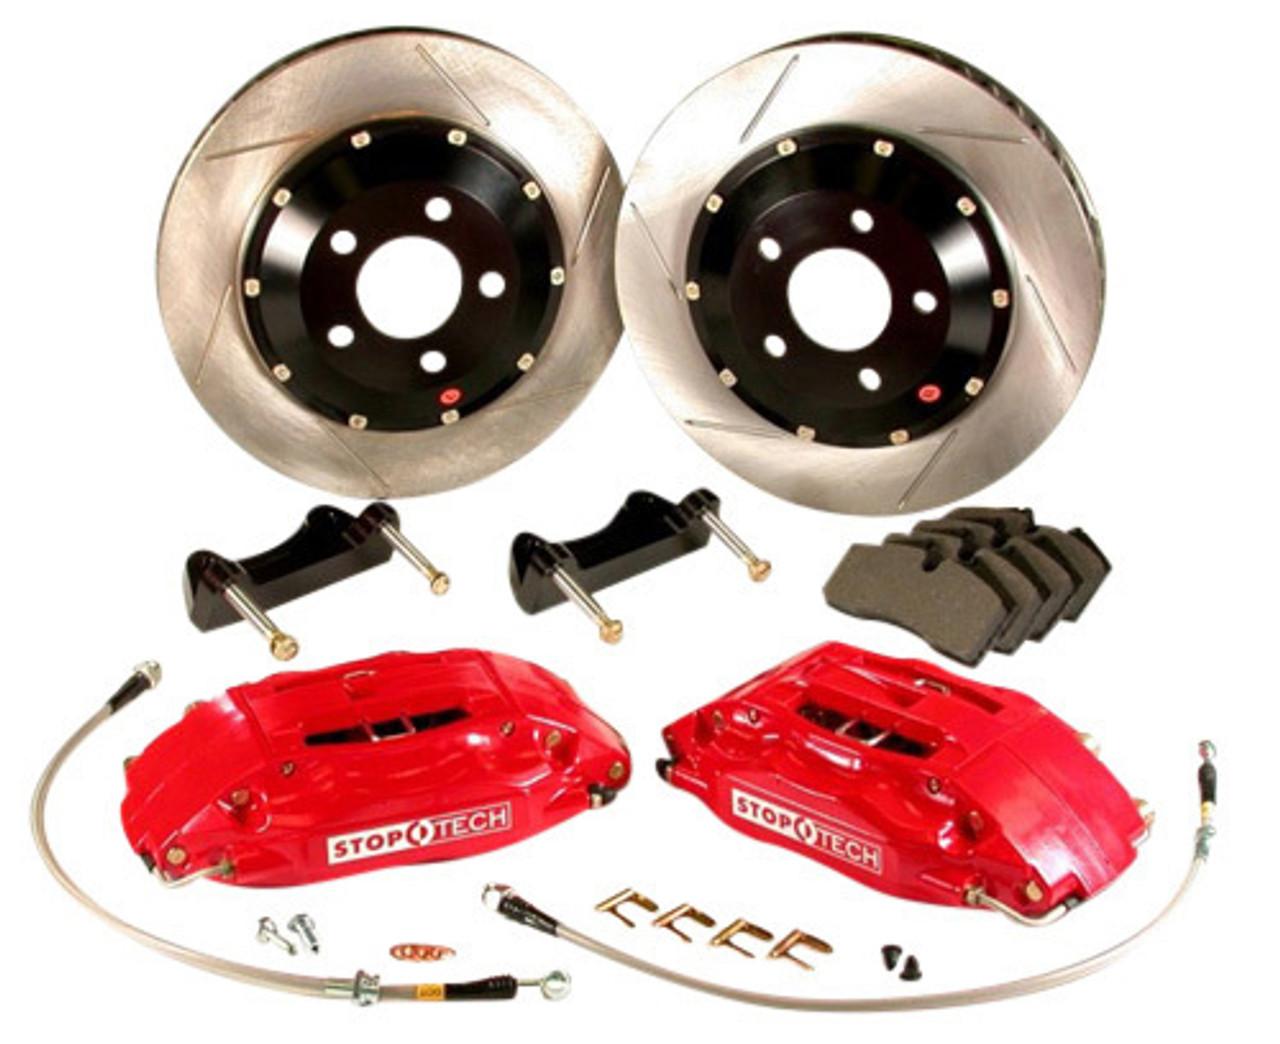 Disc Brake Caliper-Original Performance Front Right fits 03-05 Saab 9-3